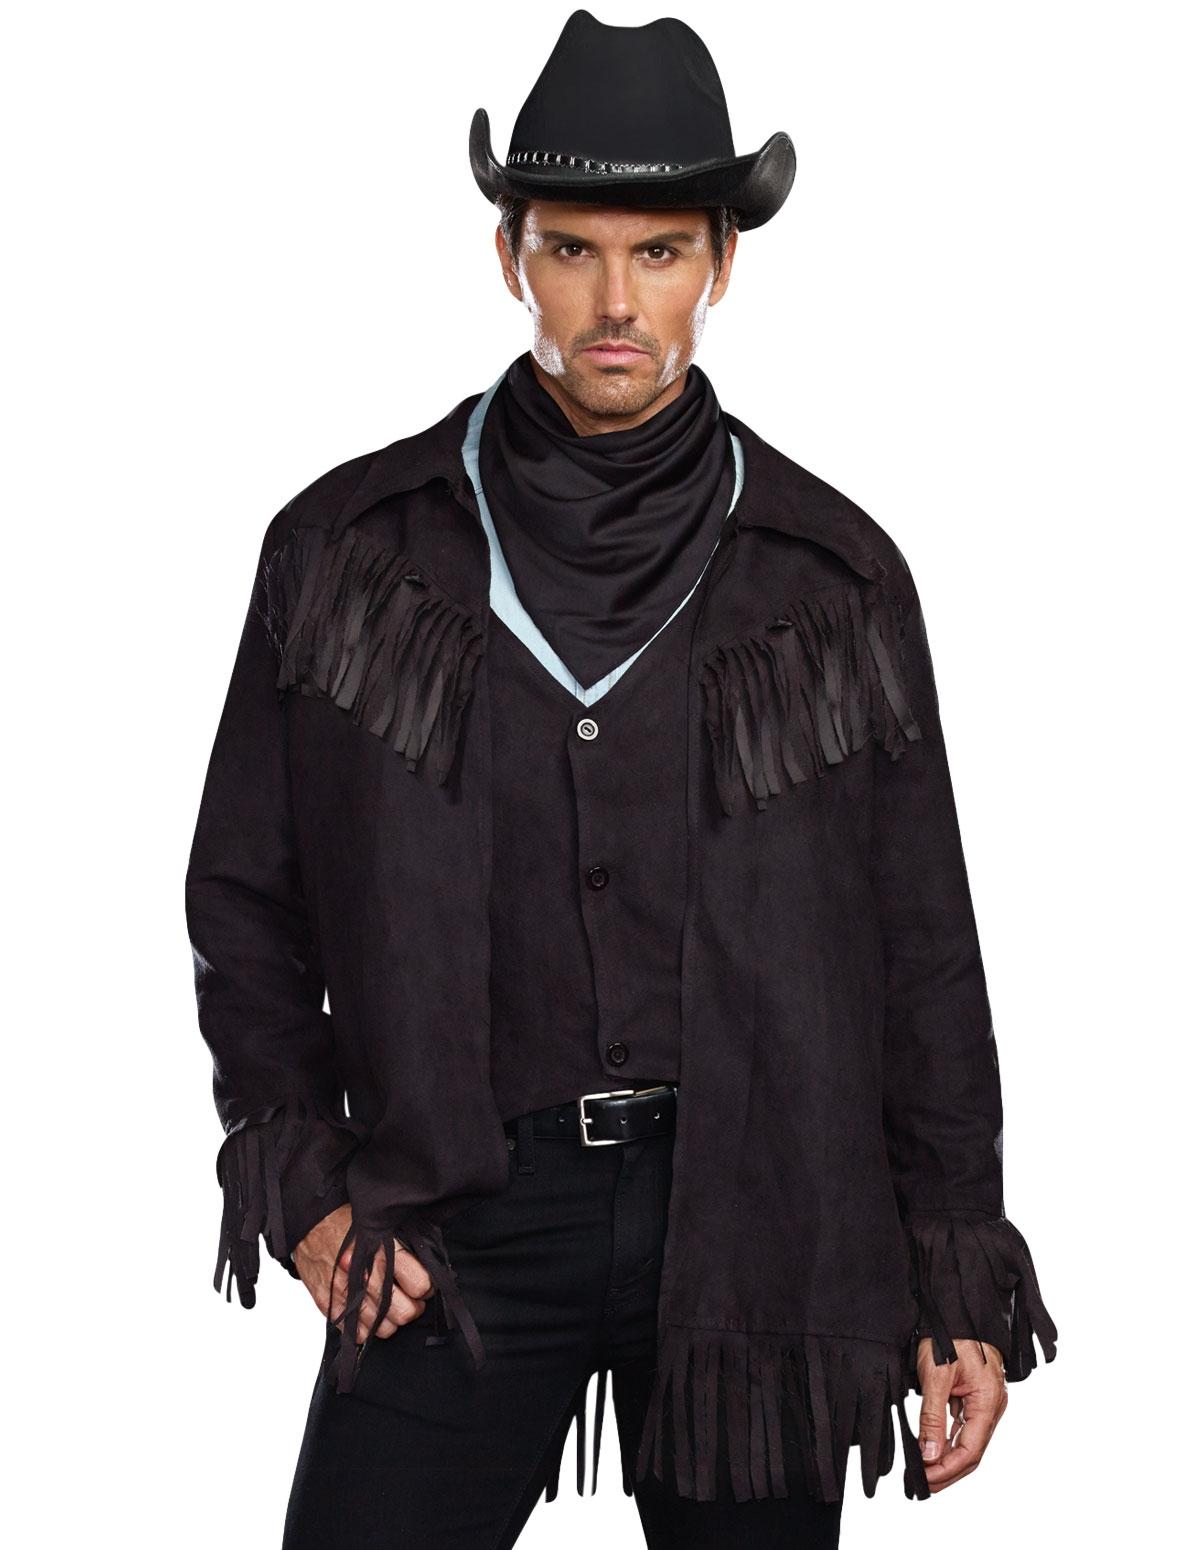 Mr. Western 4Pc Costume